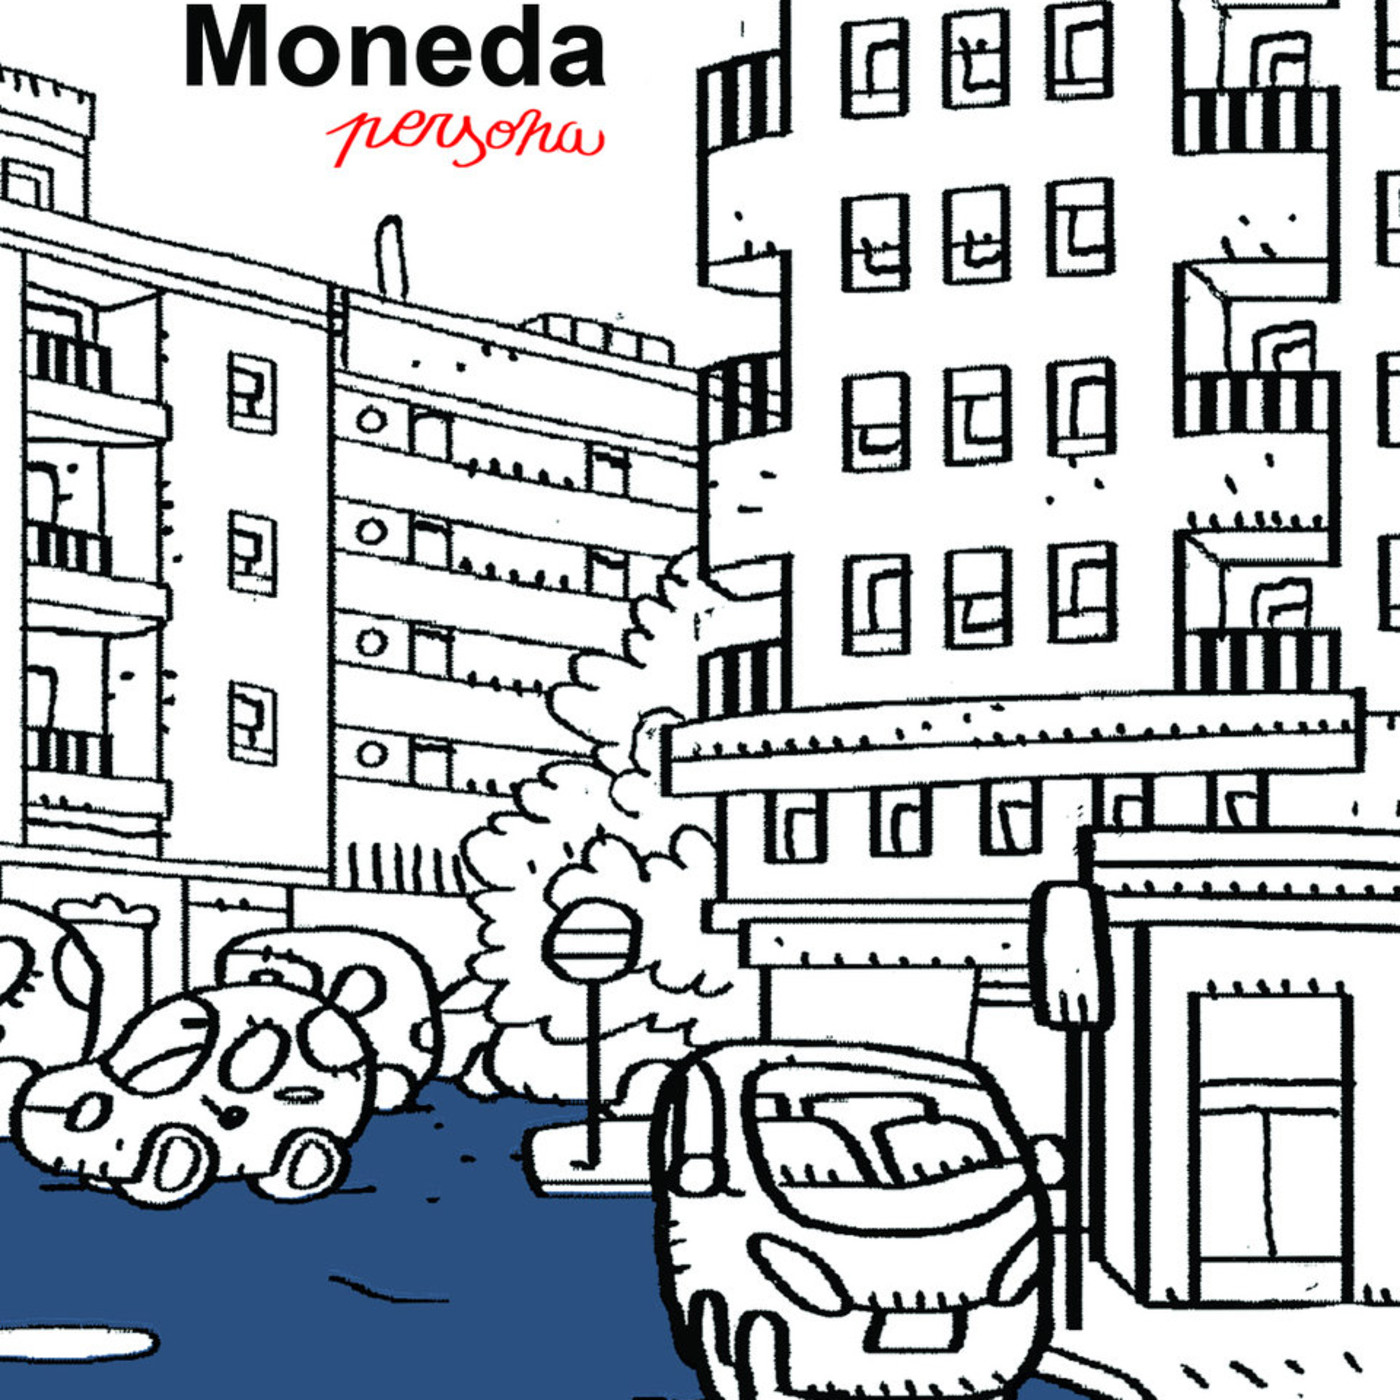 El Riff - Moneda